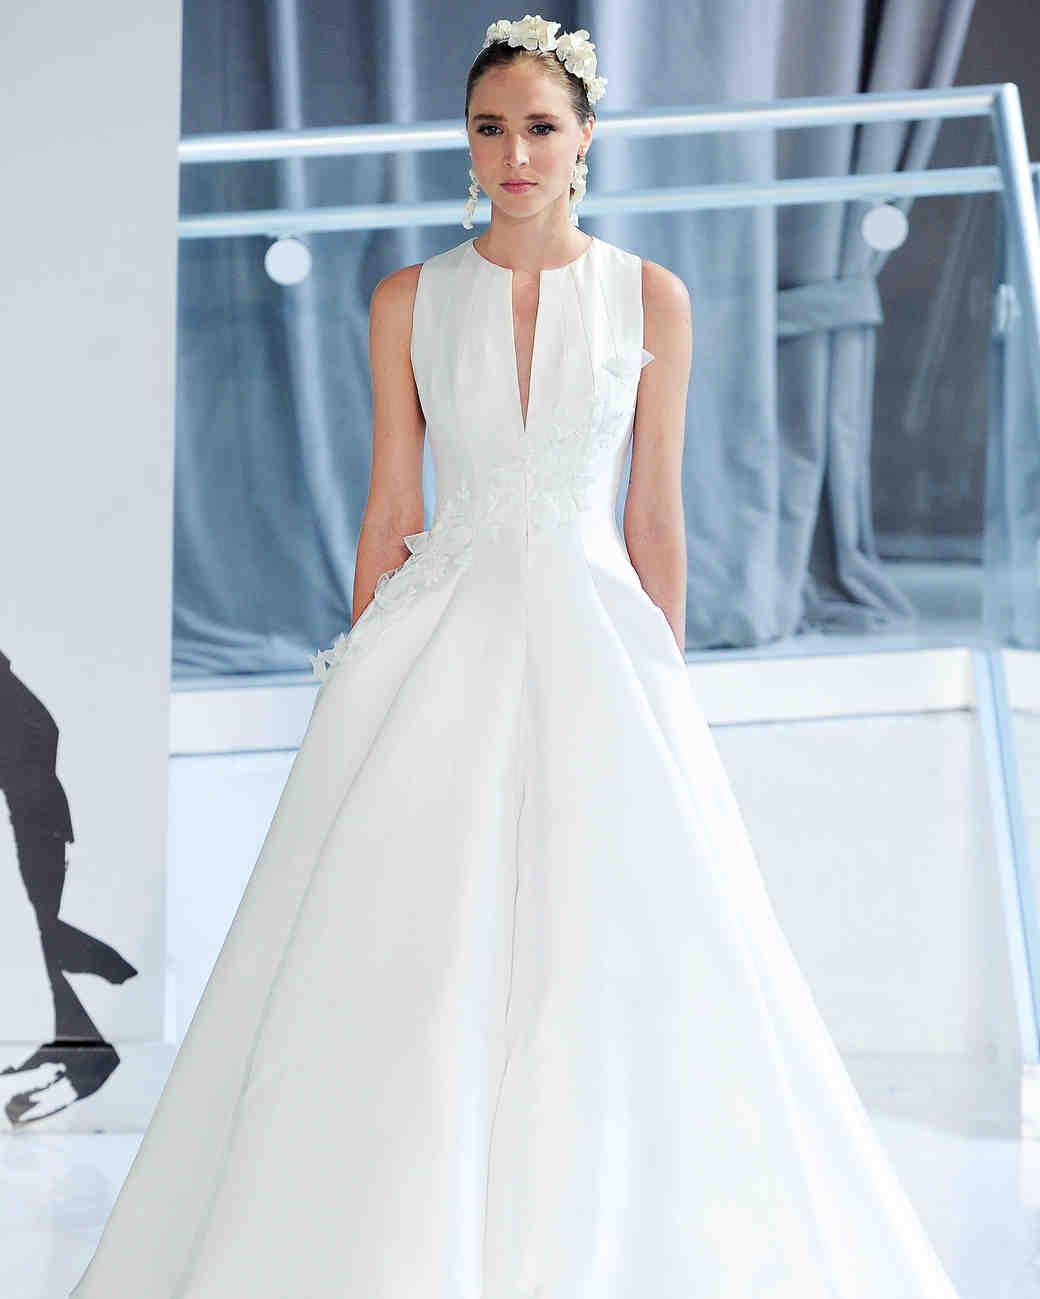 Funky 1940 Wedding Dress Inspiration - Wedding Dress - googeb.com